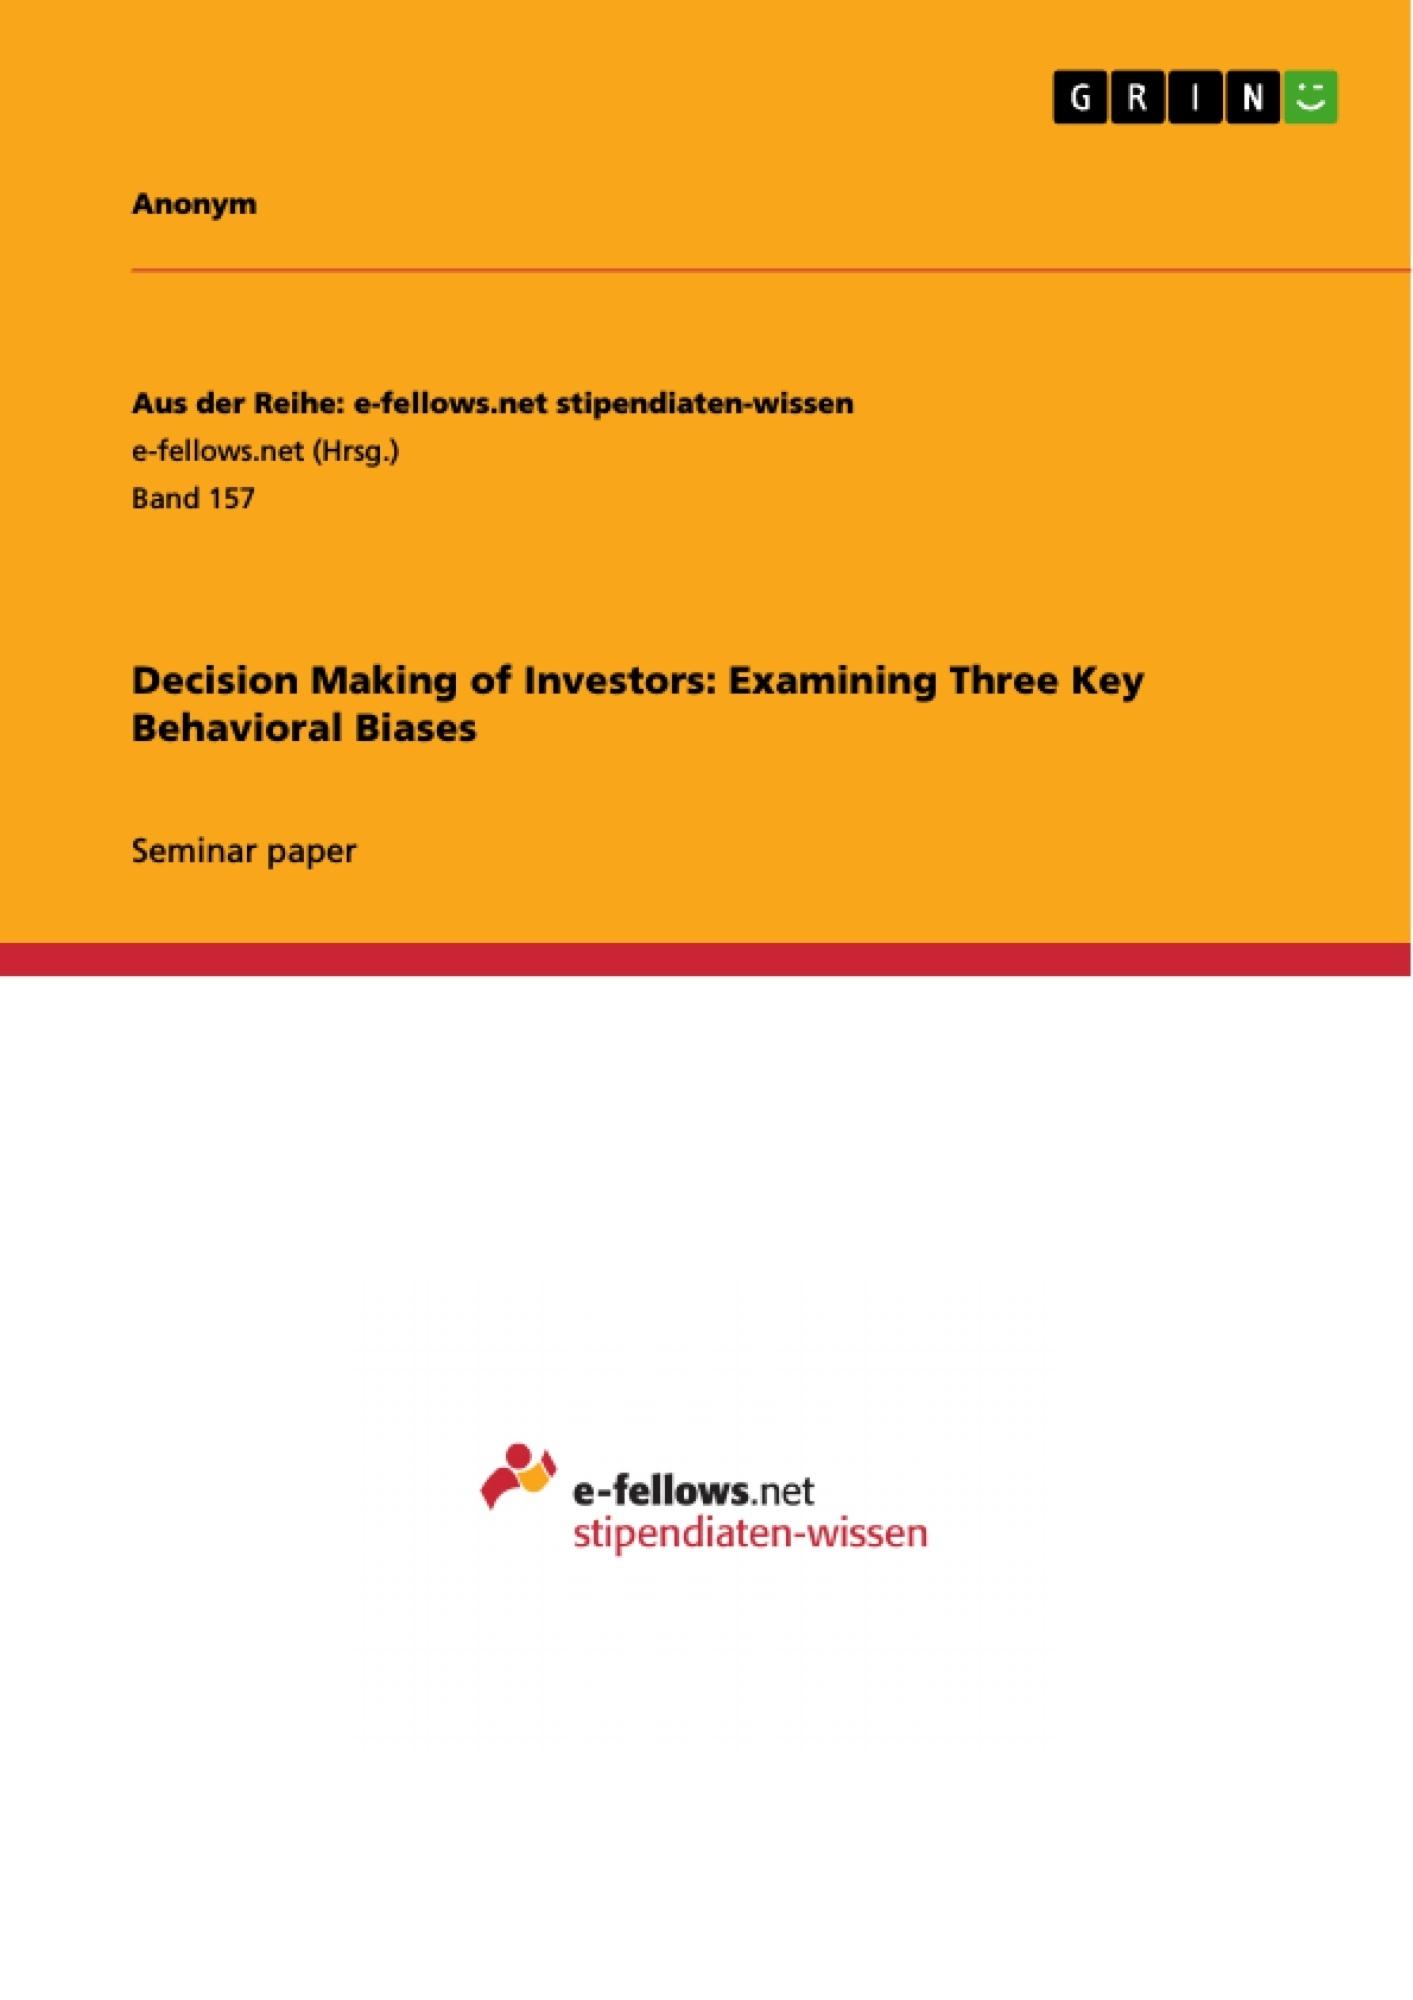 Title: Decision Making of Investors: Examining Three Key Behavioral Biases